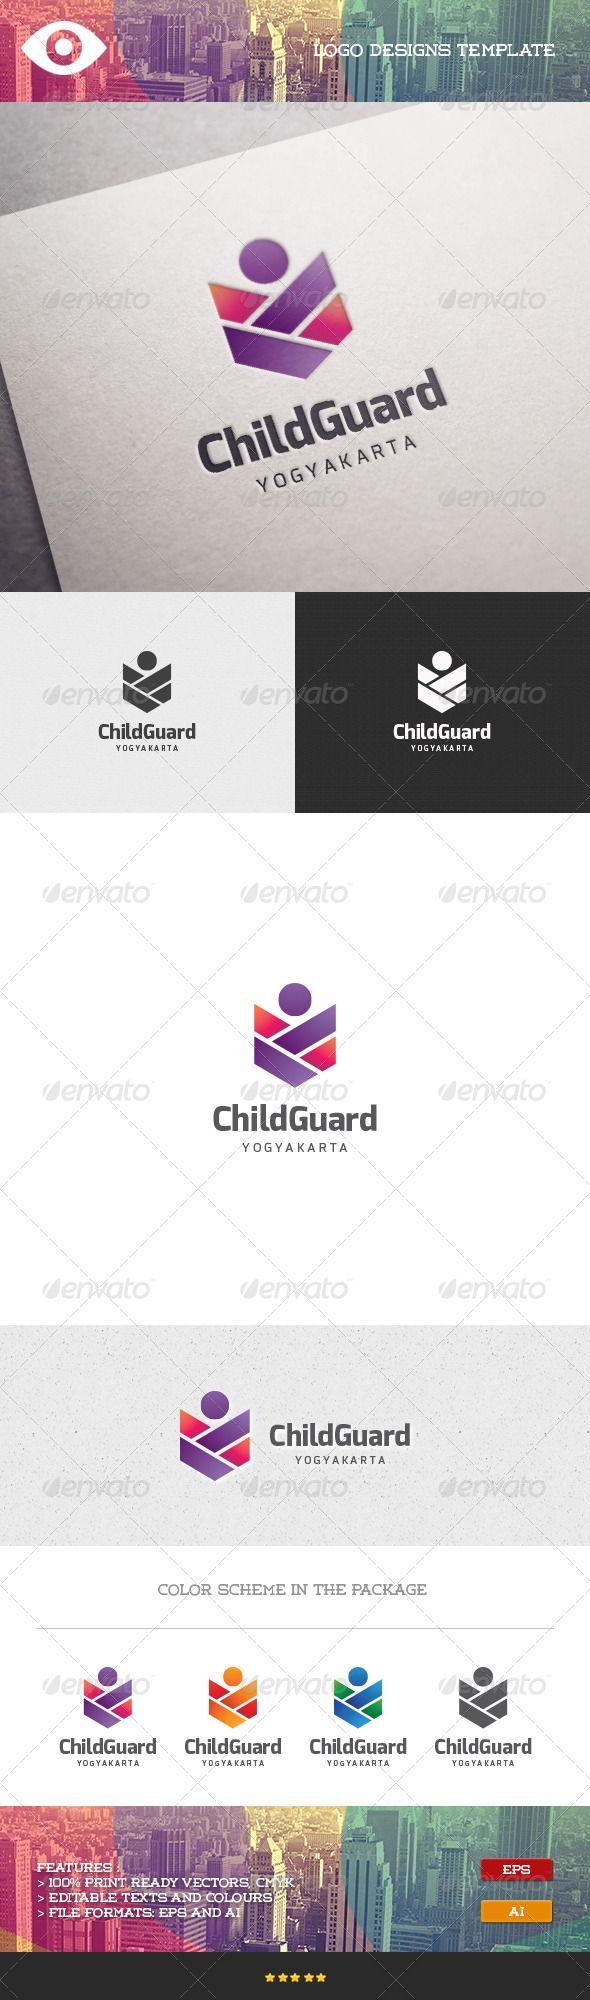 Mejores 44 imágenes de Amazing Logo Template en Pinterest ...